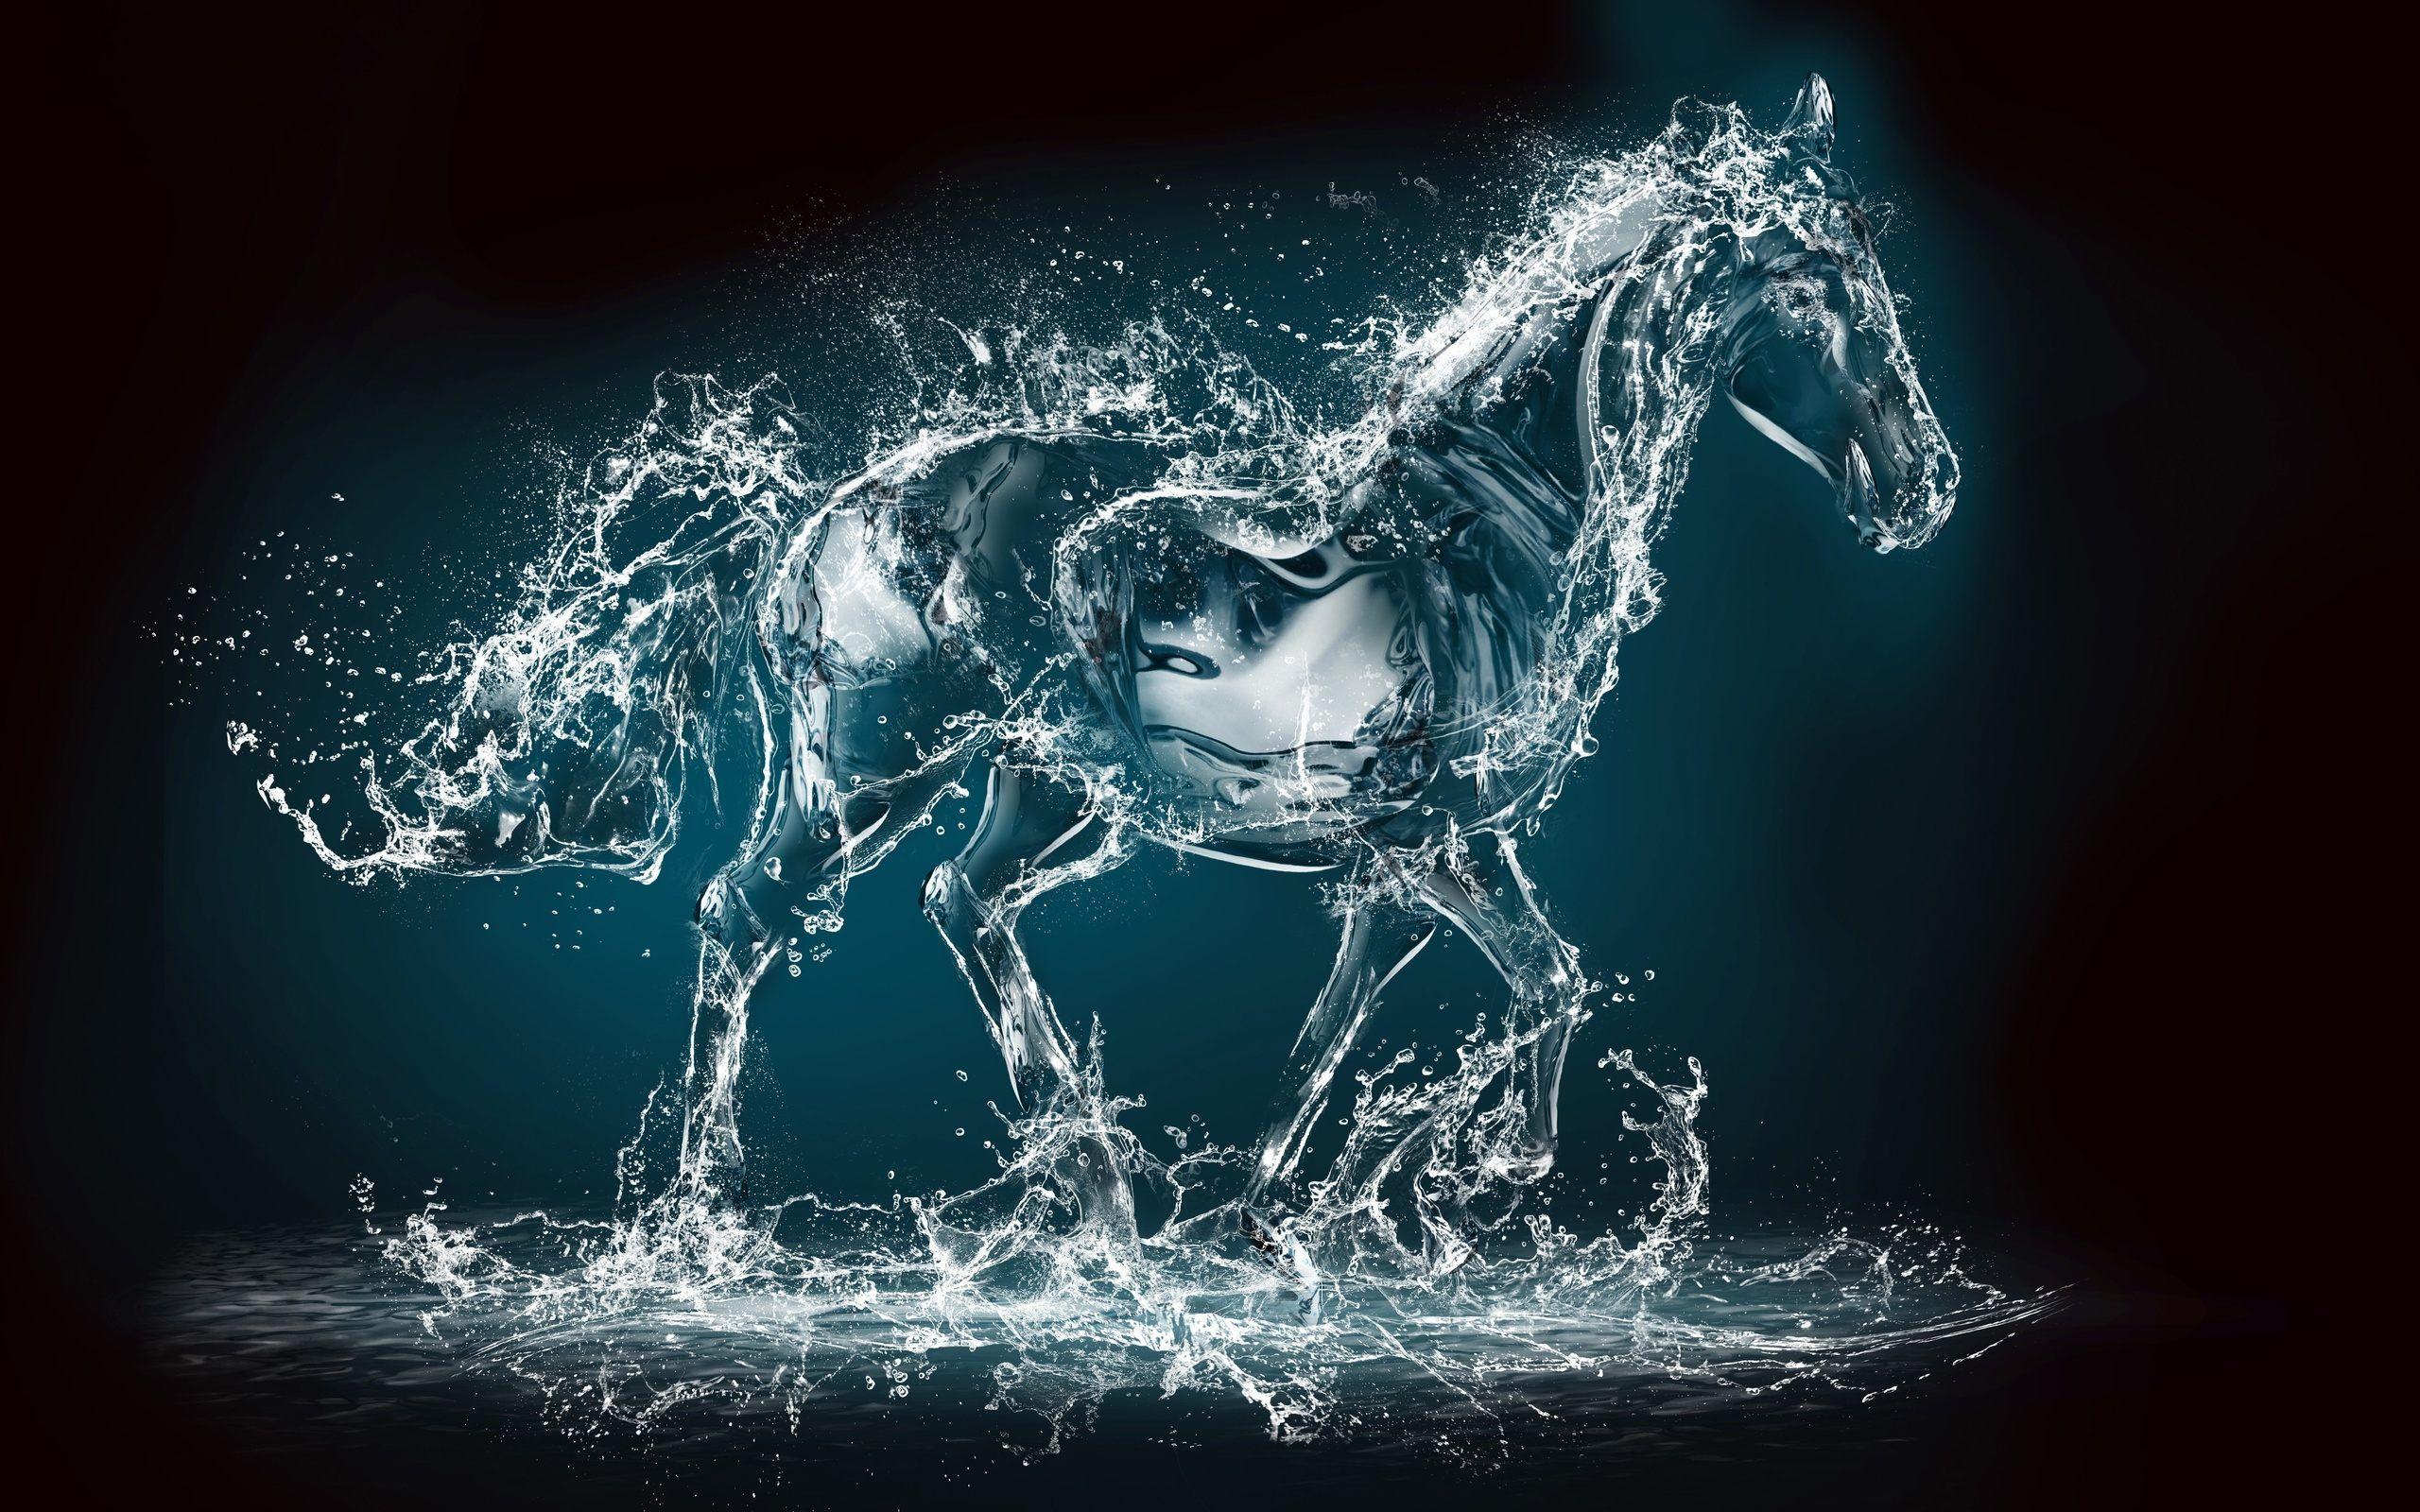 Best Wallpaper Horse Creative - 687bd0b0e40914045f9e25272a267b27  Image_639218.jpg